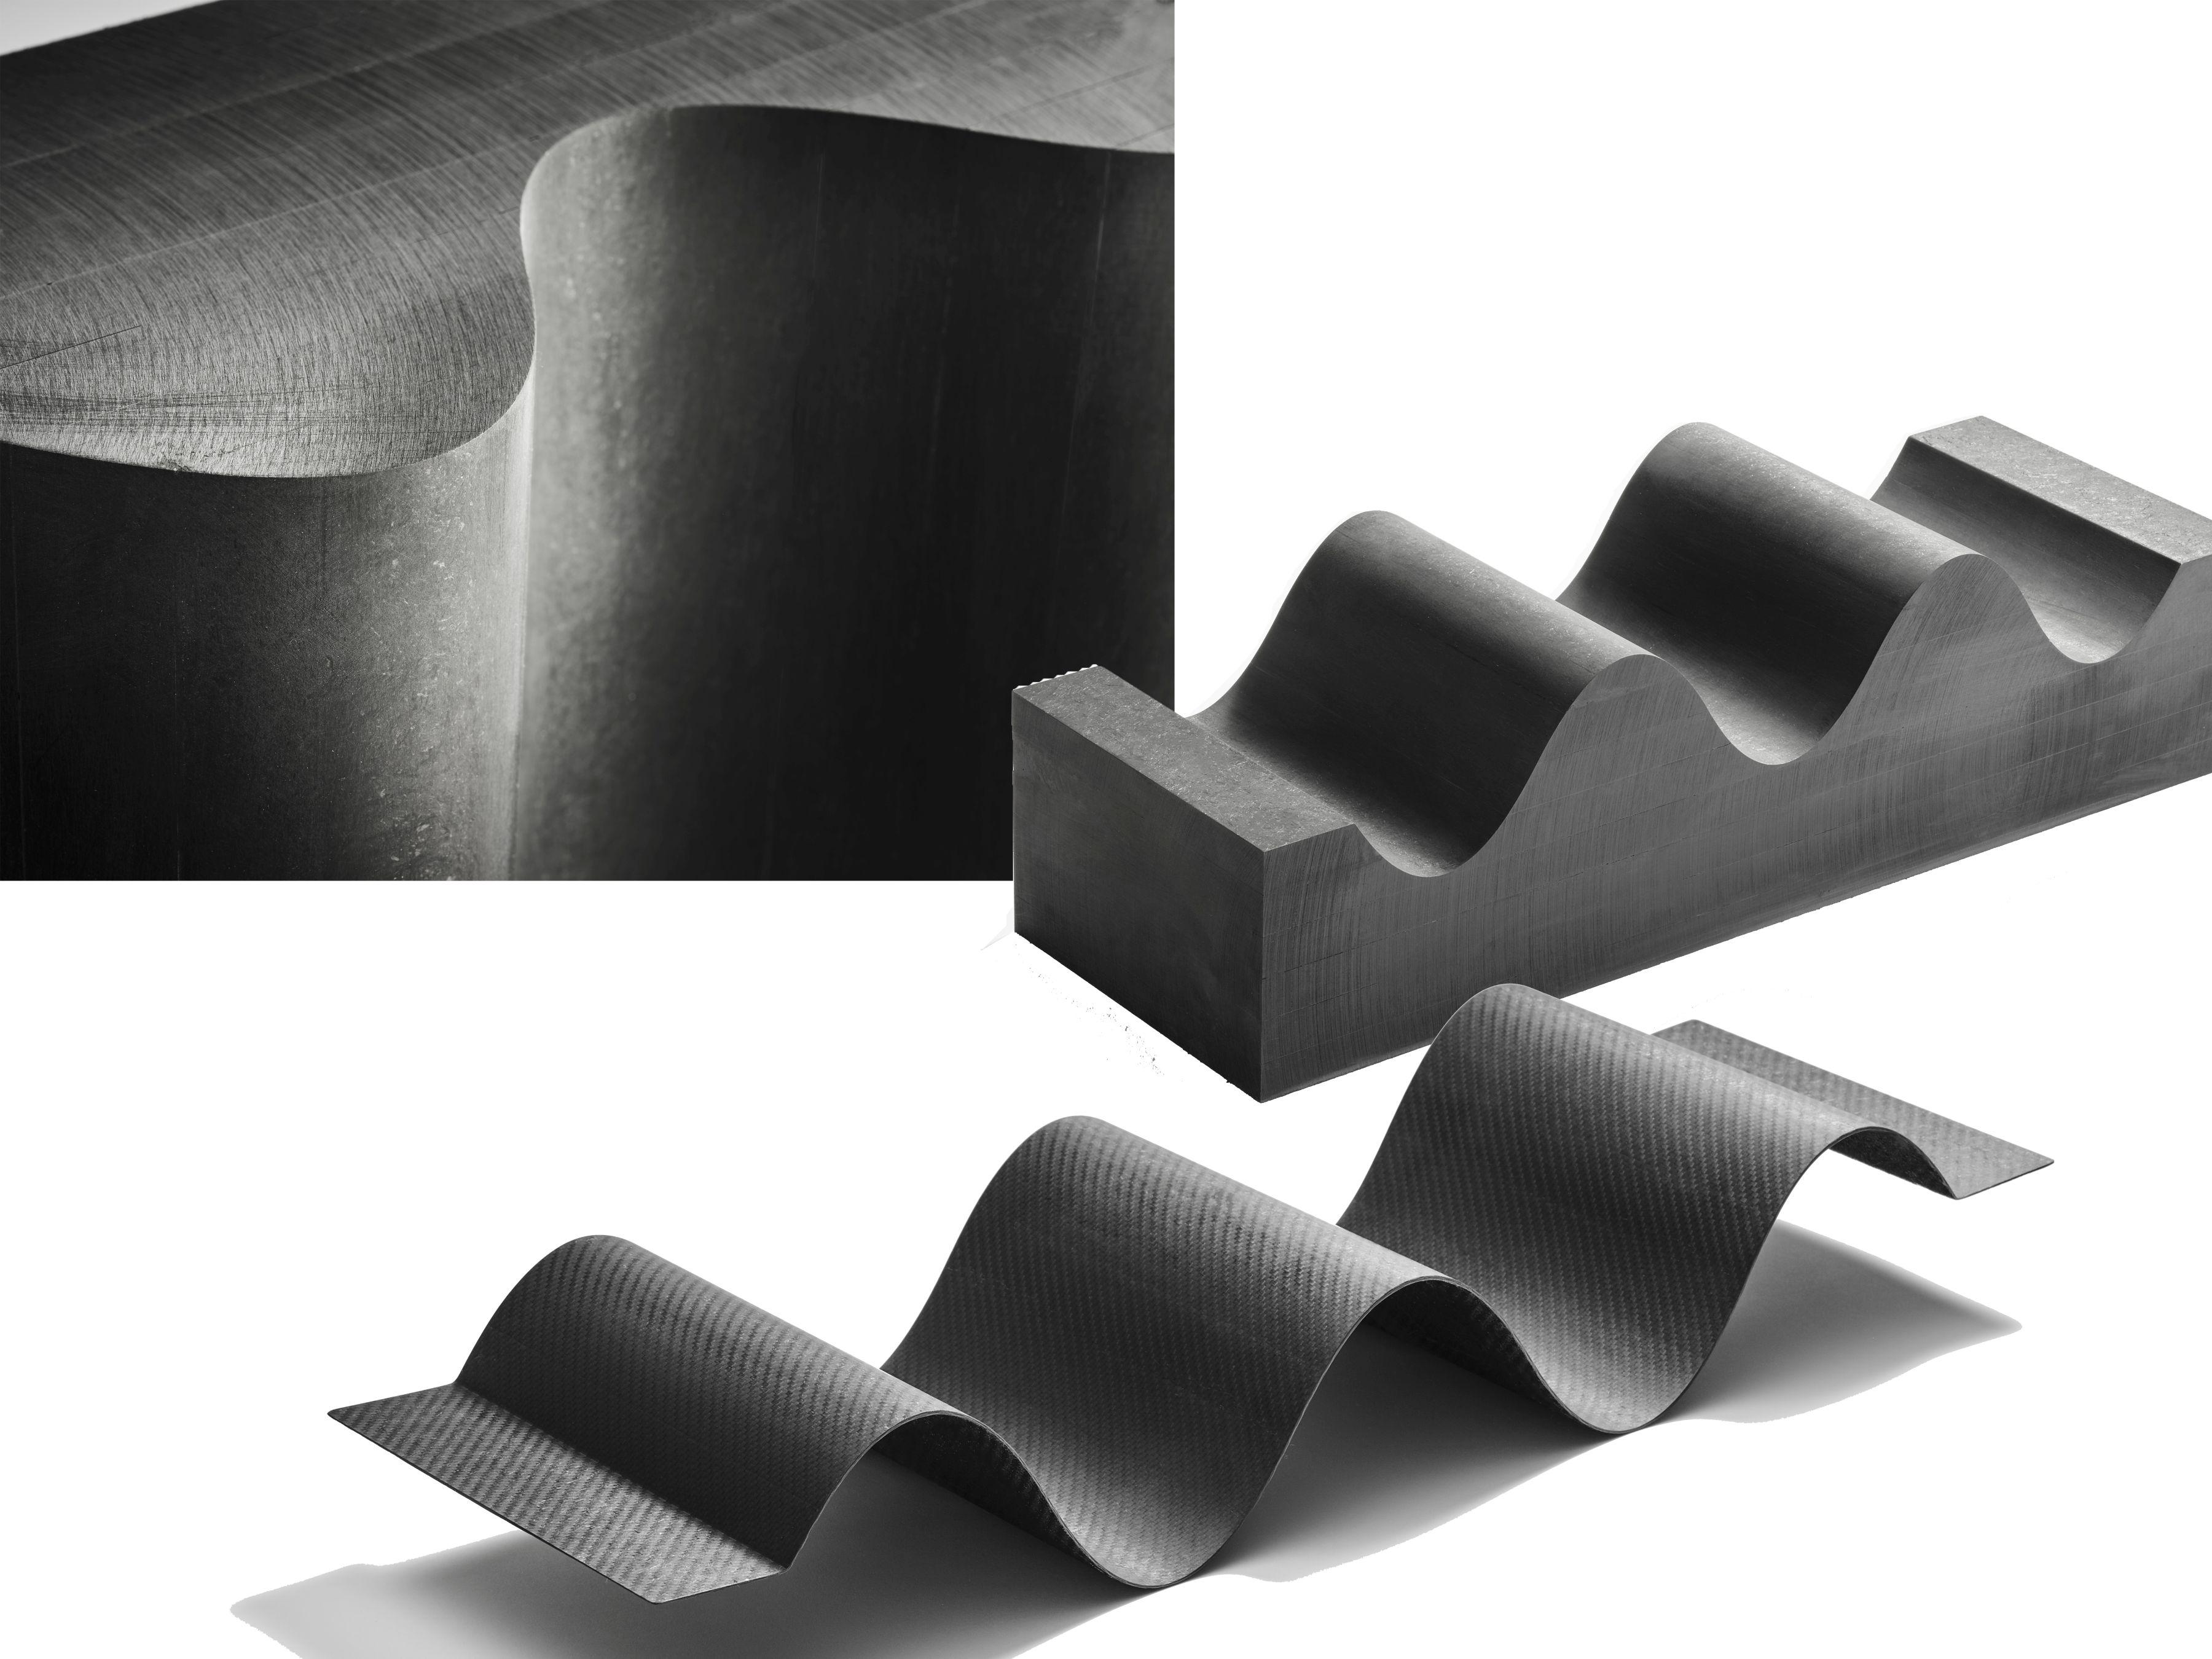 CFP Composites 360 isotropic carbon fiber composite for tooling